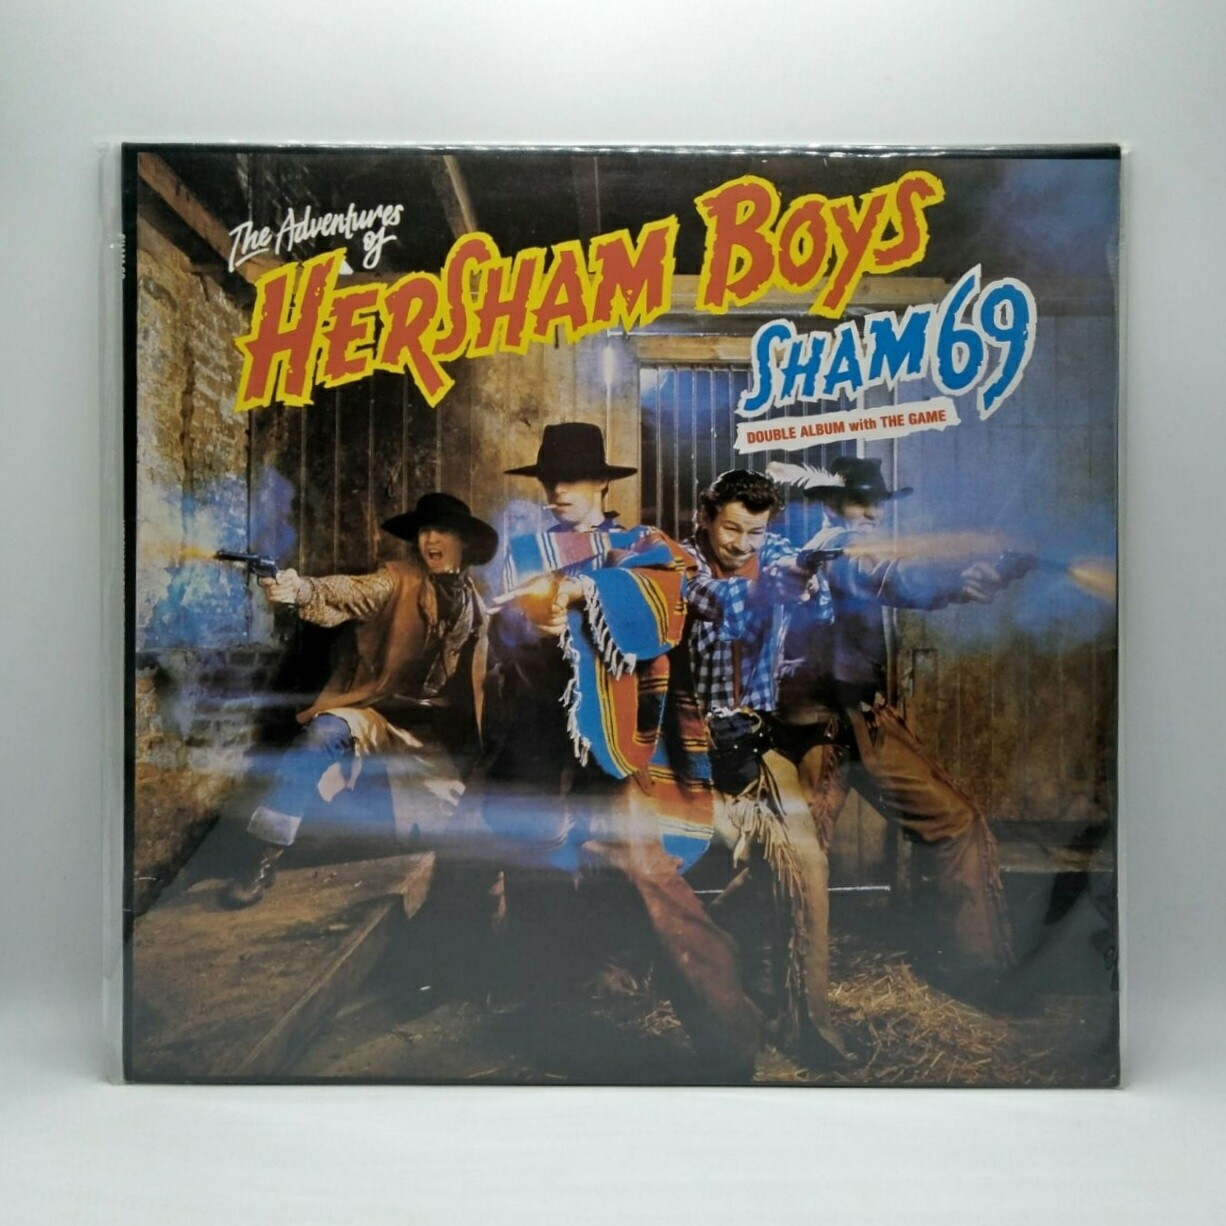 [USED] SHAM 69 -THE ADVENTURES OF HERSHAM BOYS & THE GAME- 2XLP